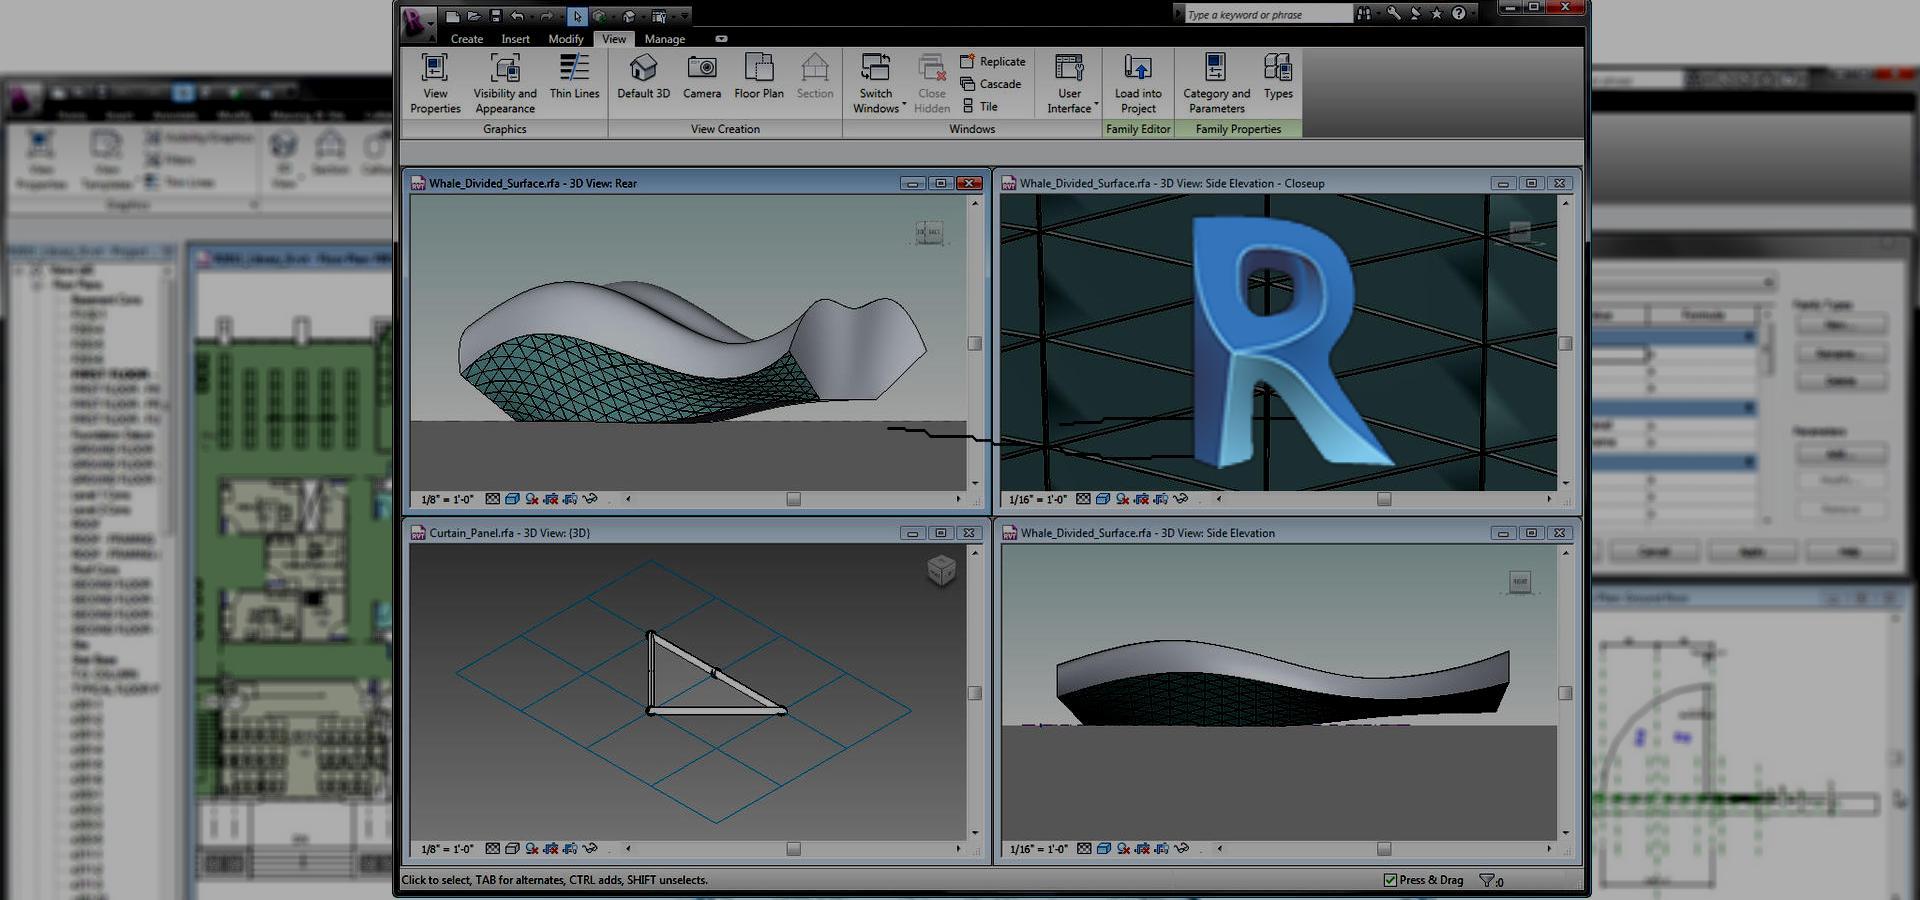 Открыта запись на курс Autodesk Revit Architecture